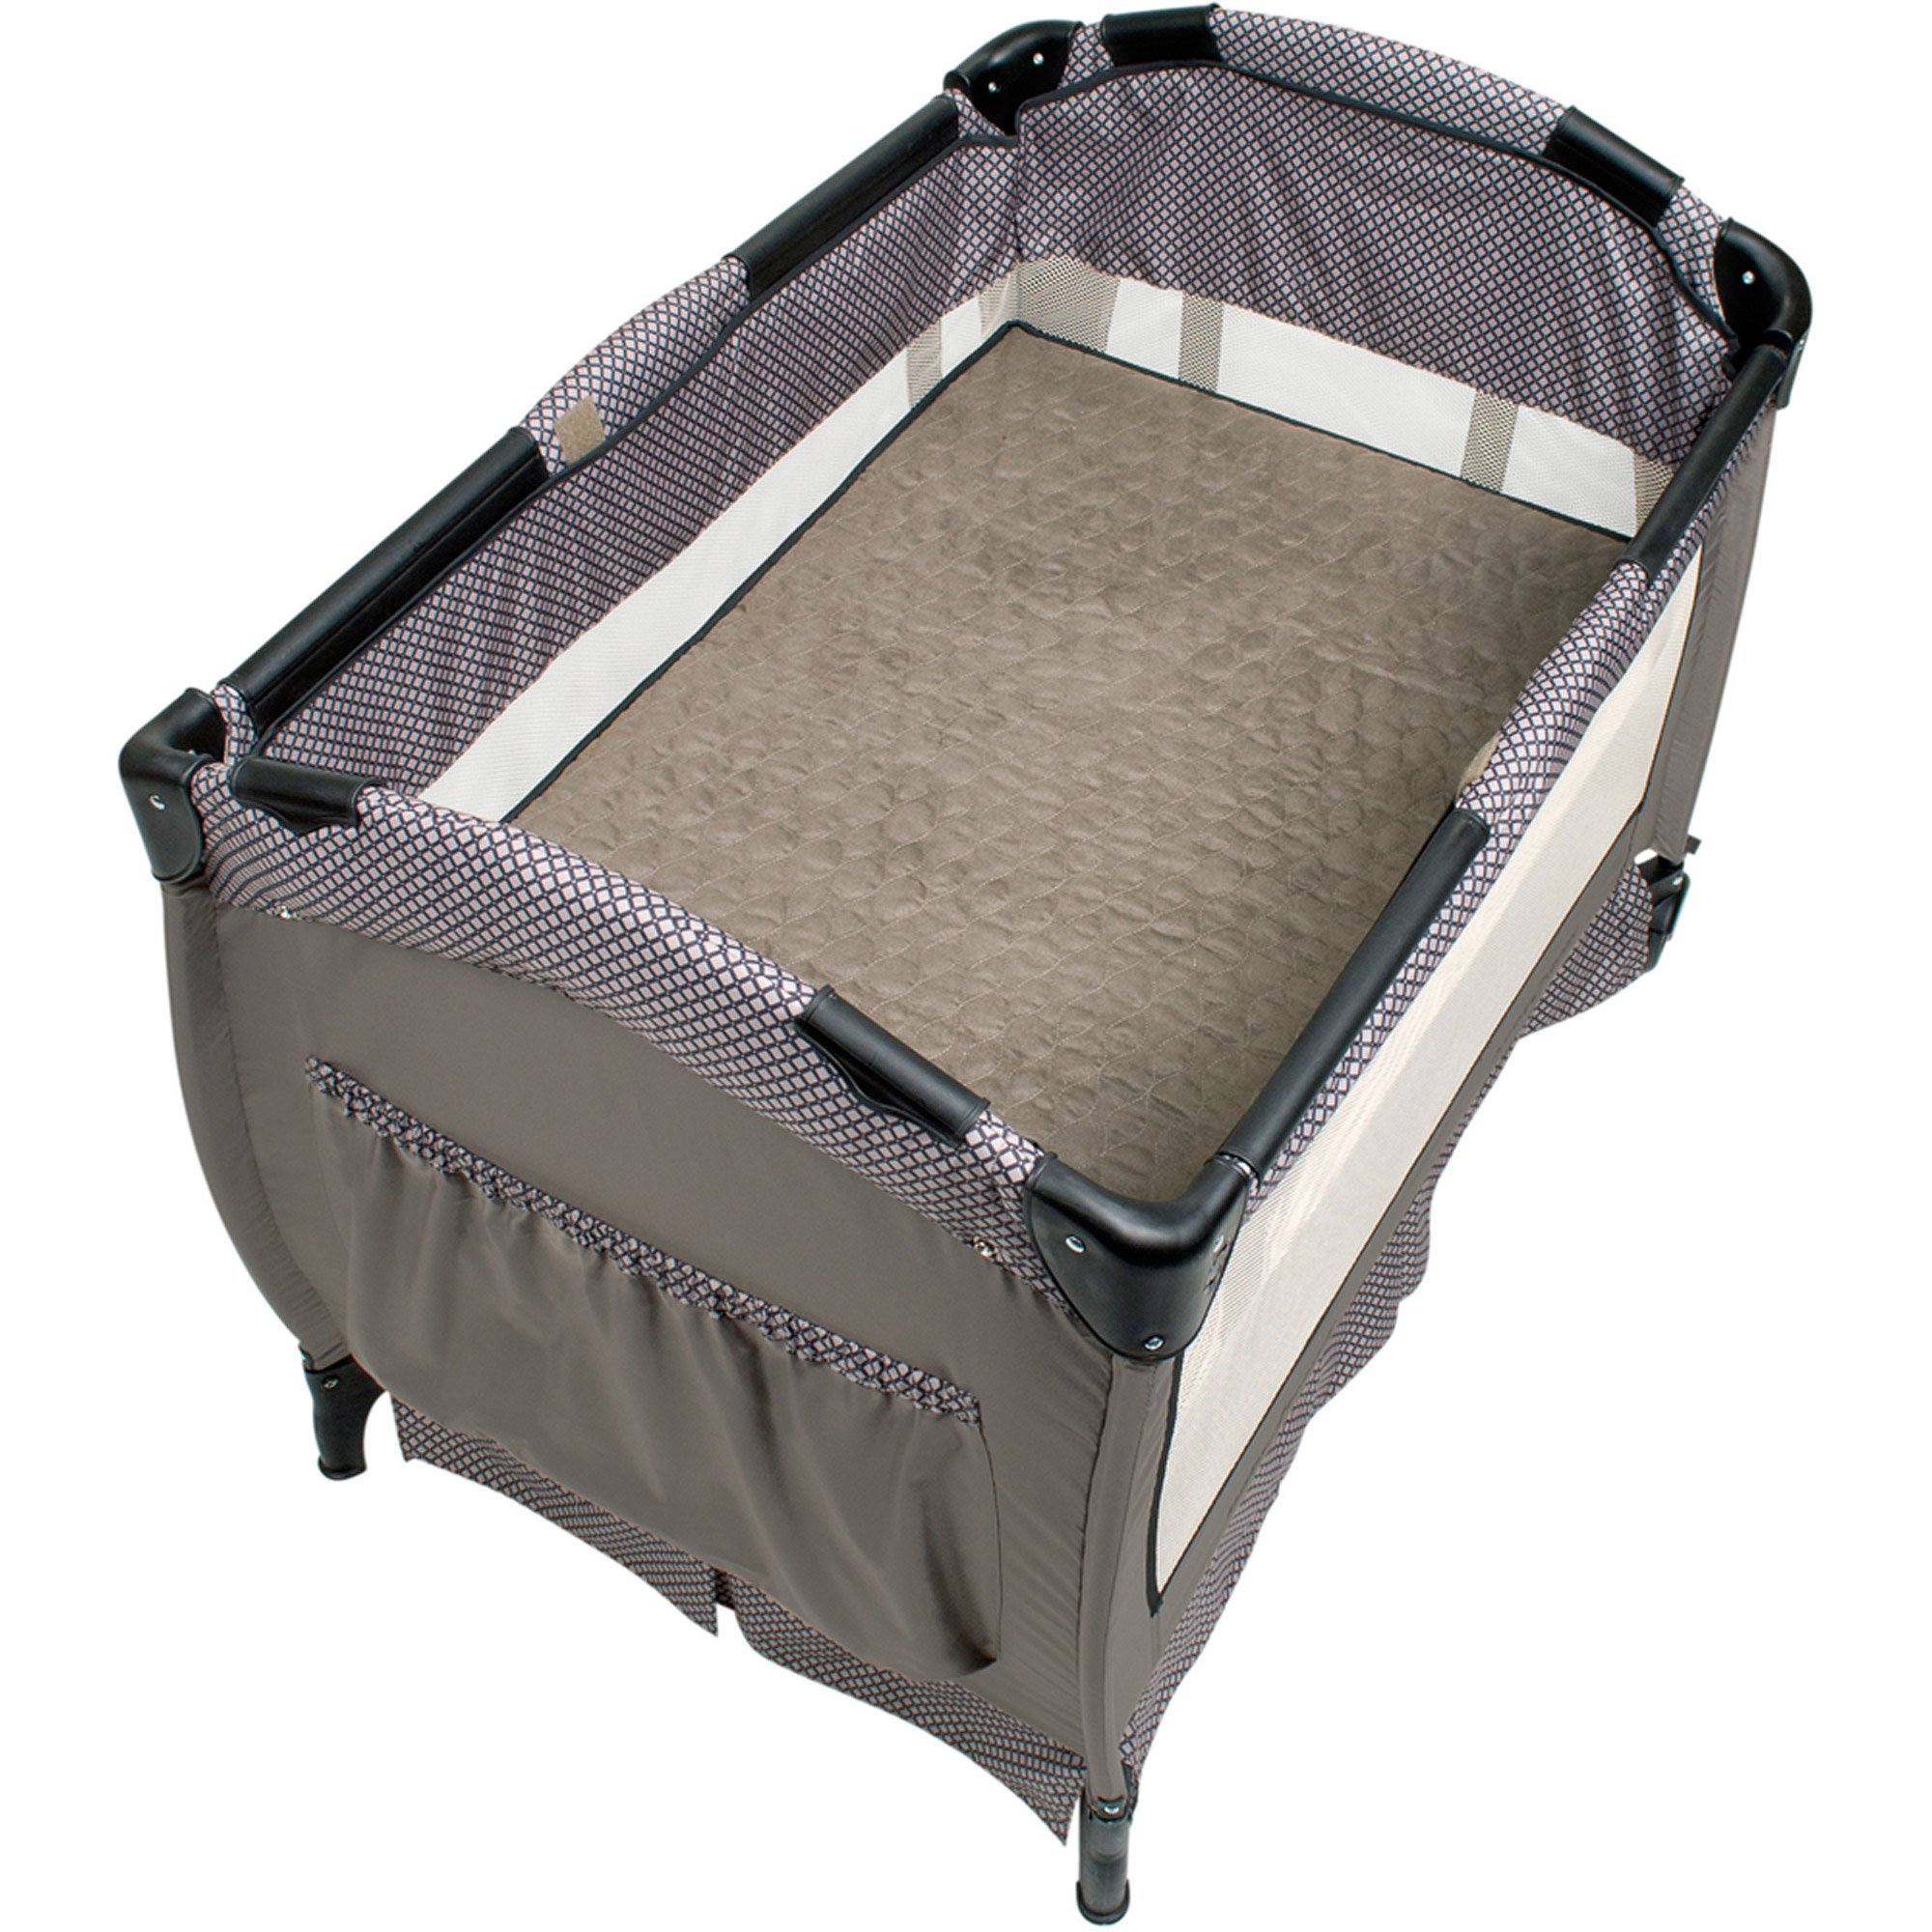 Baby Trend Deluxe Nursery Center Playard Hathaway Walmart